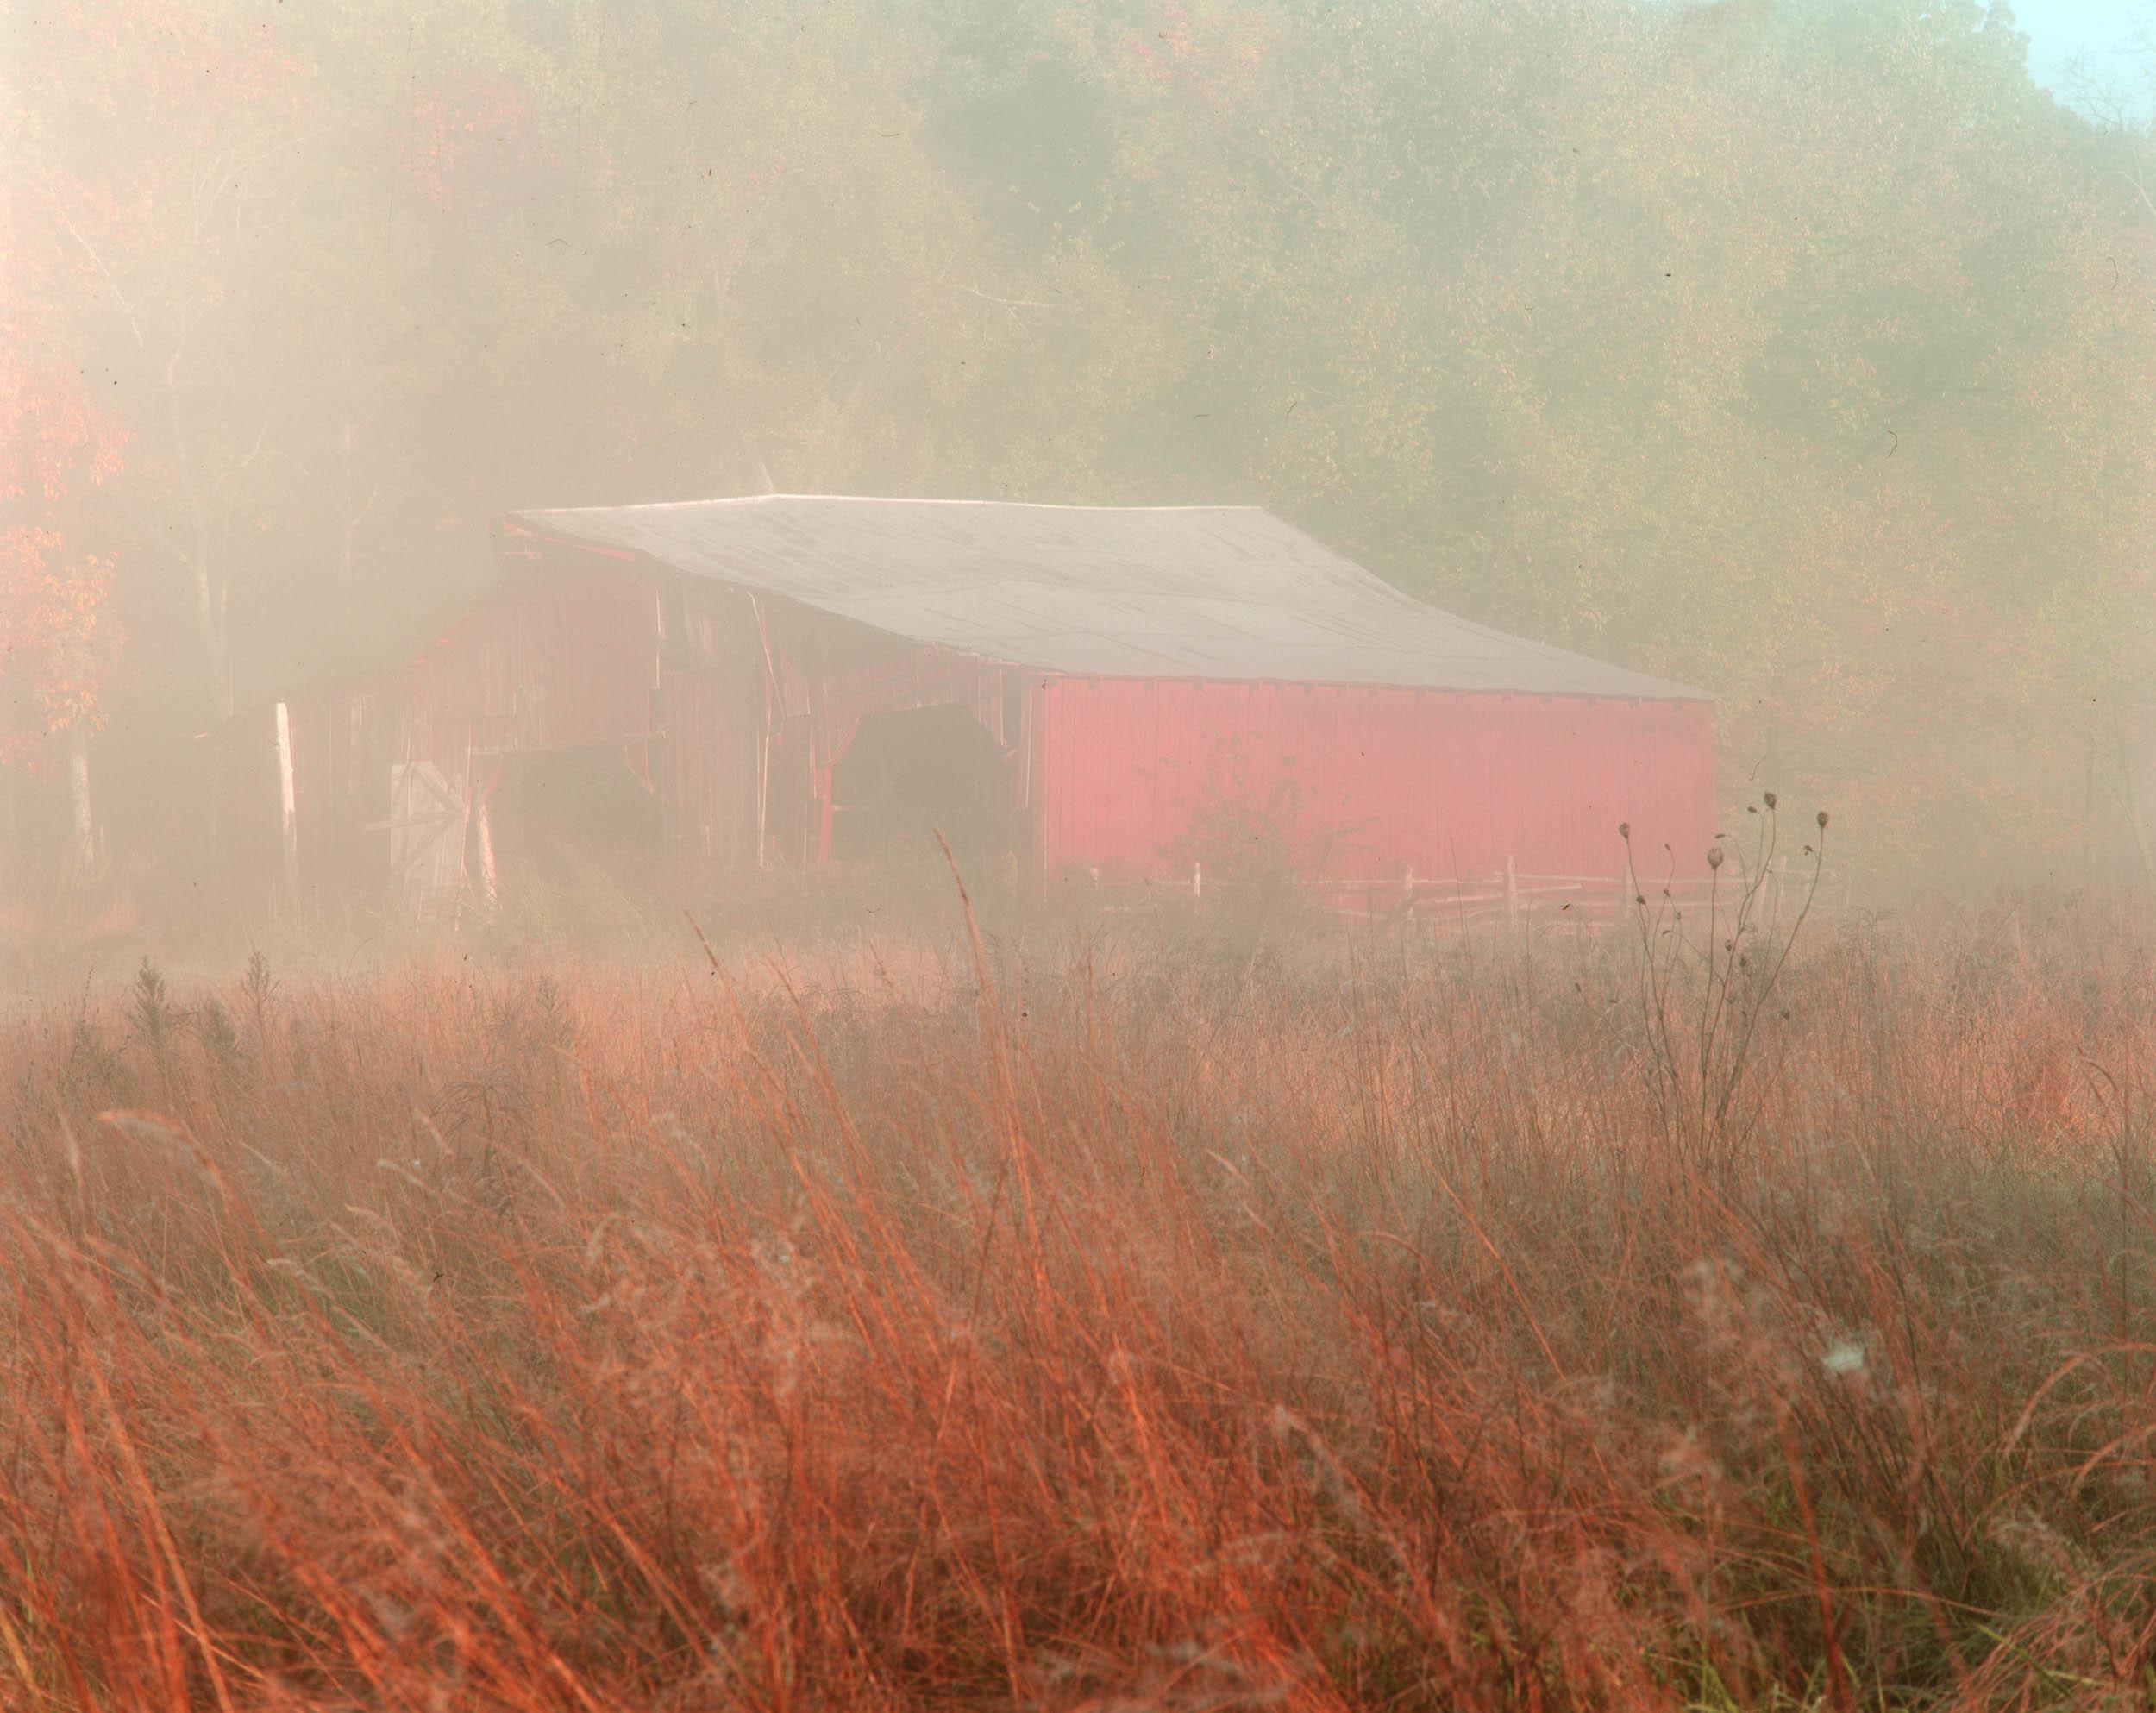 Red Barn in Fog